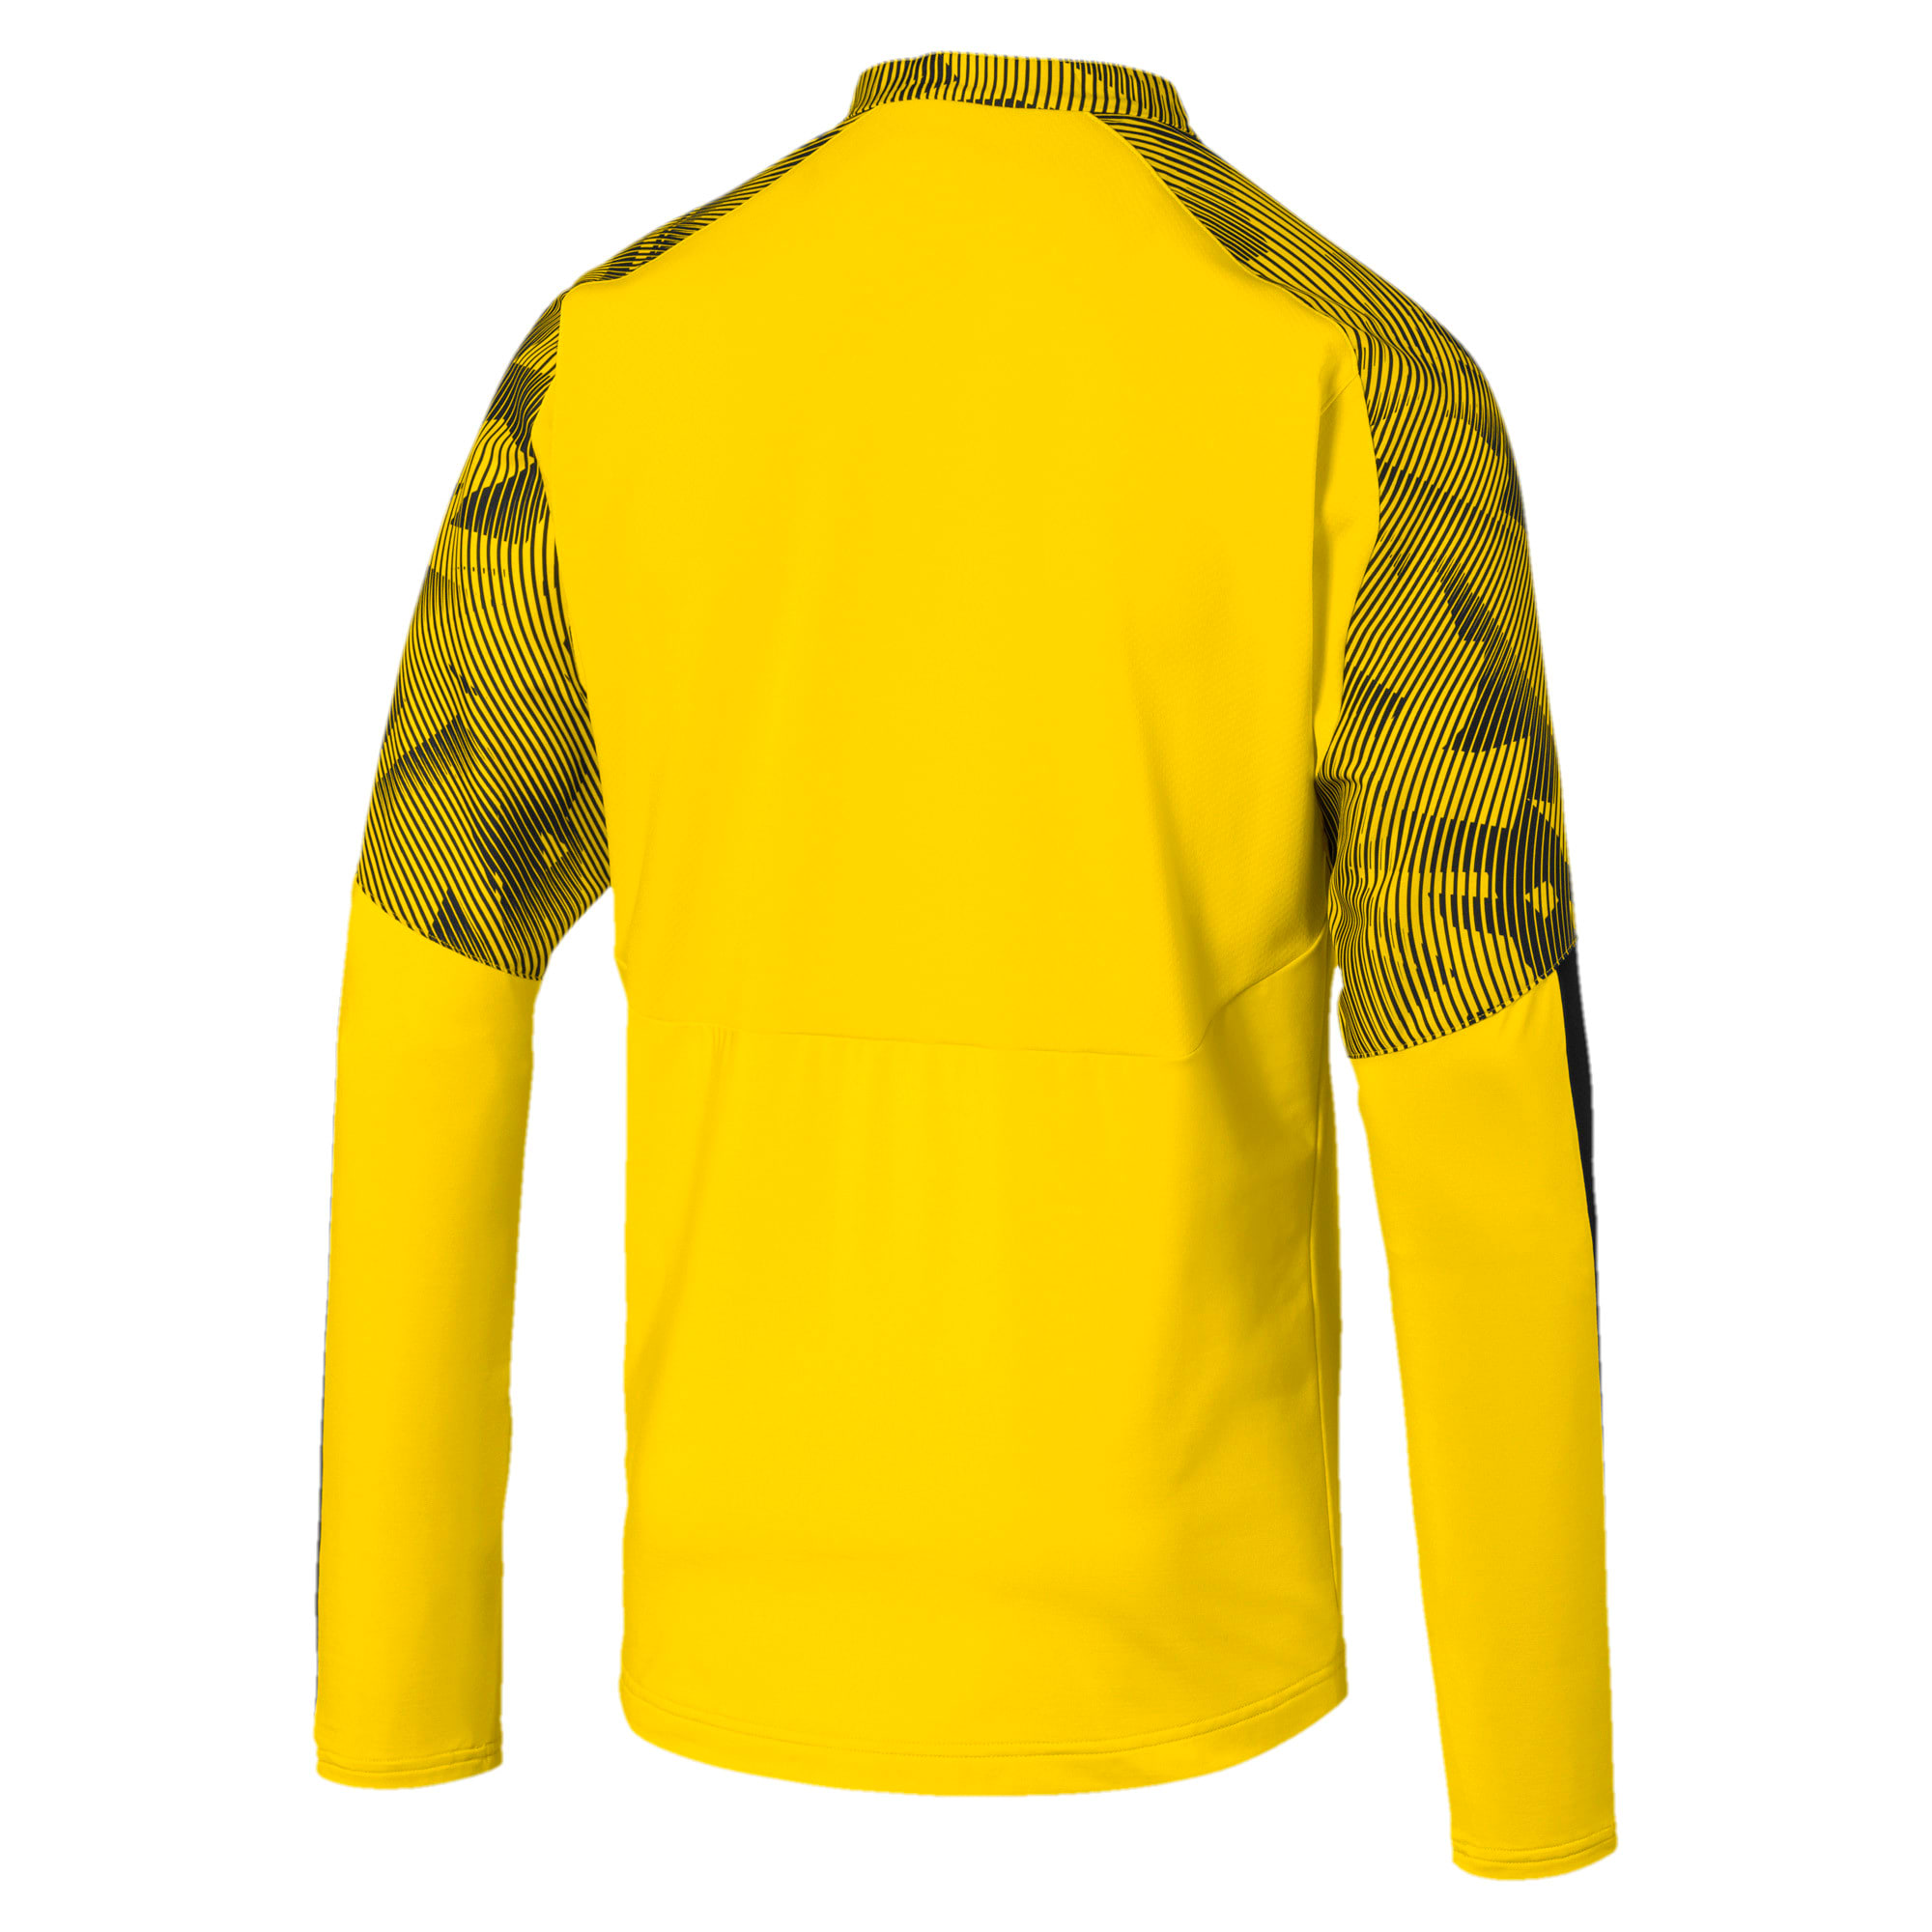 Thumbnail 5 of BVB Men's 1/4 Zip Training Top, Cyber Yellow-Puma Black, medium